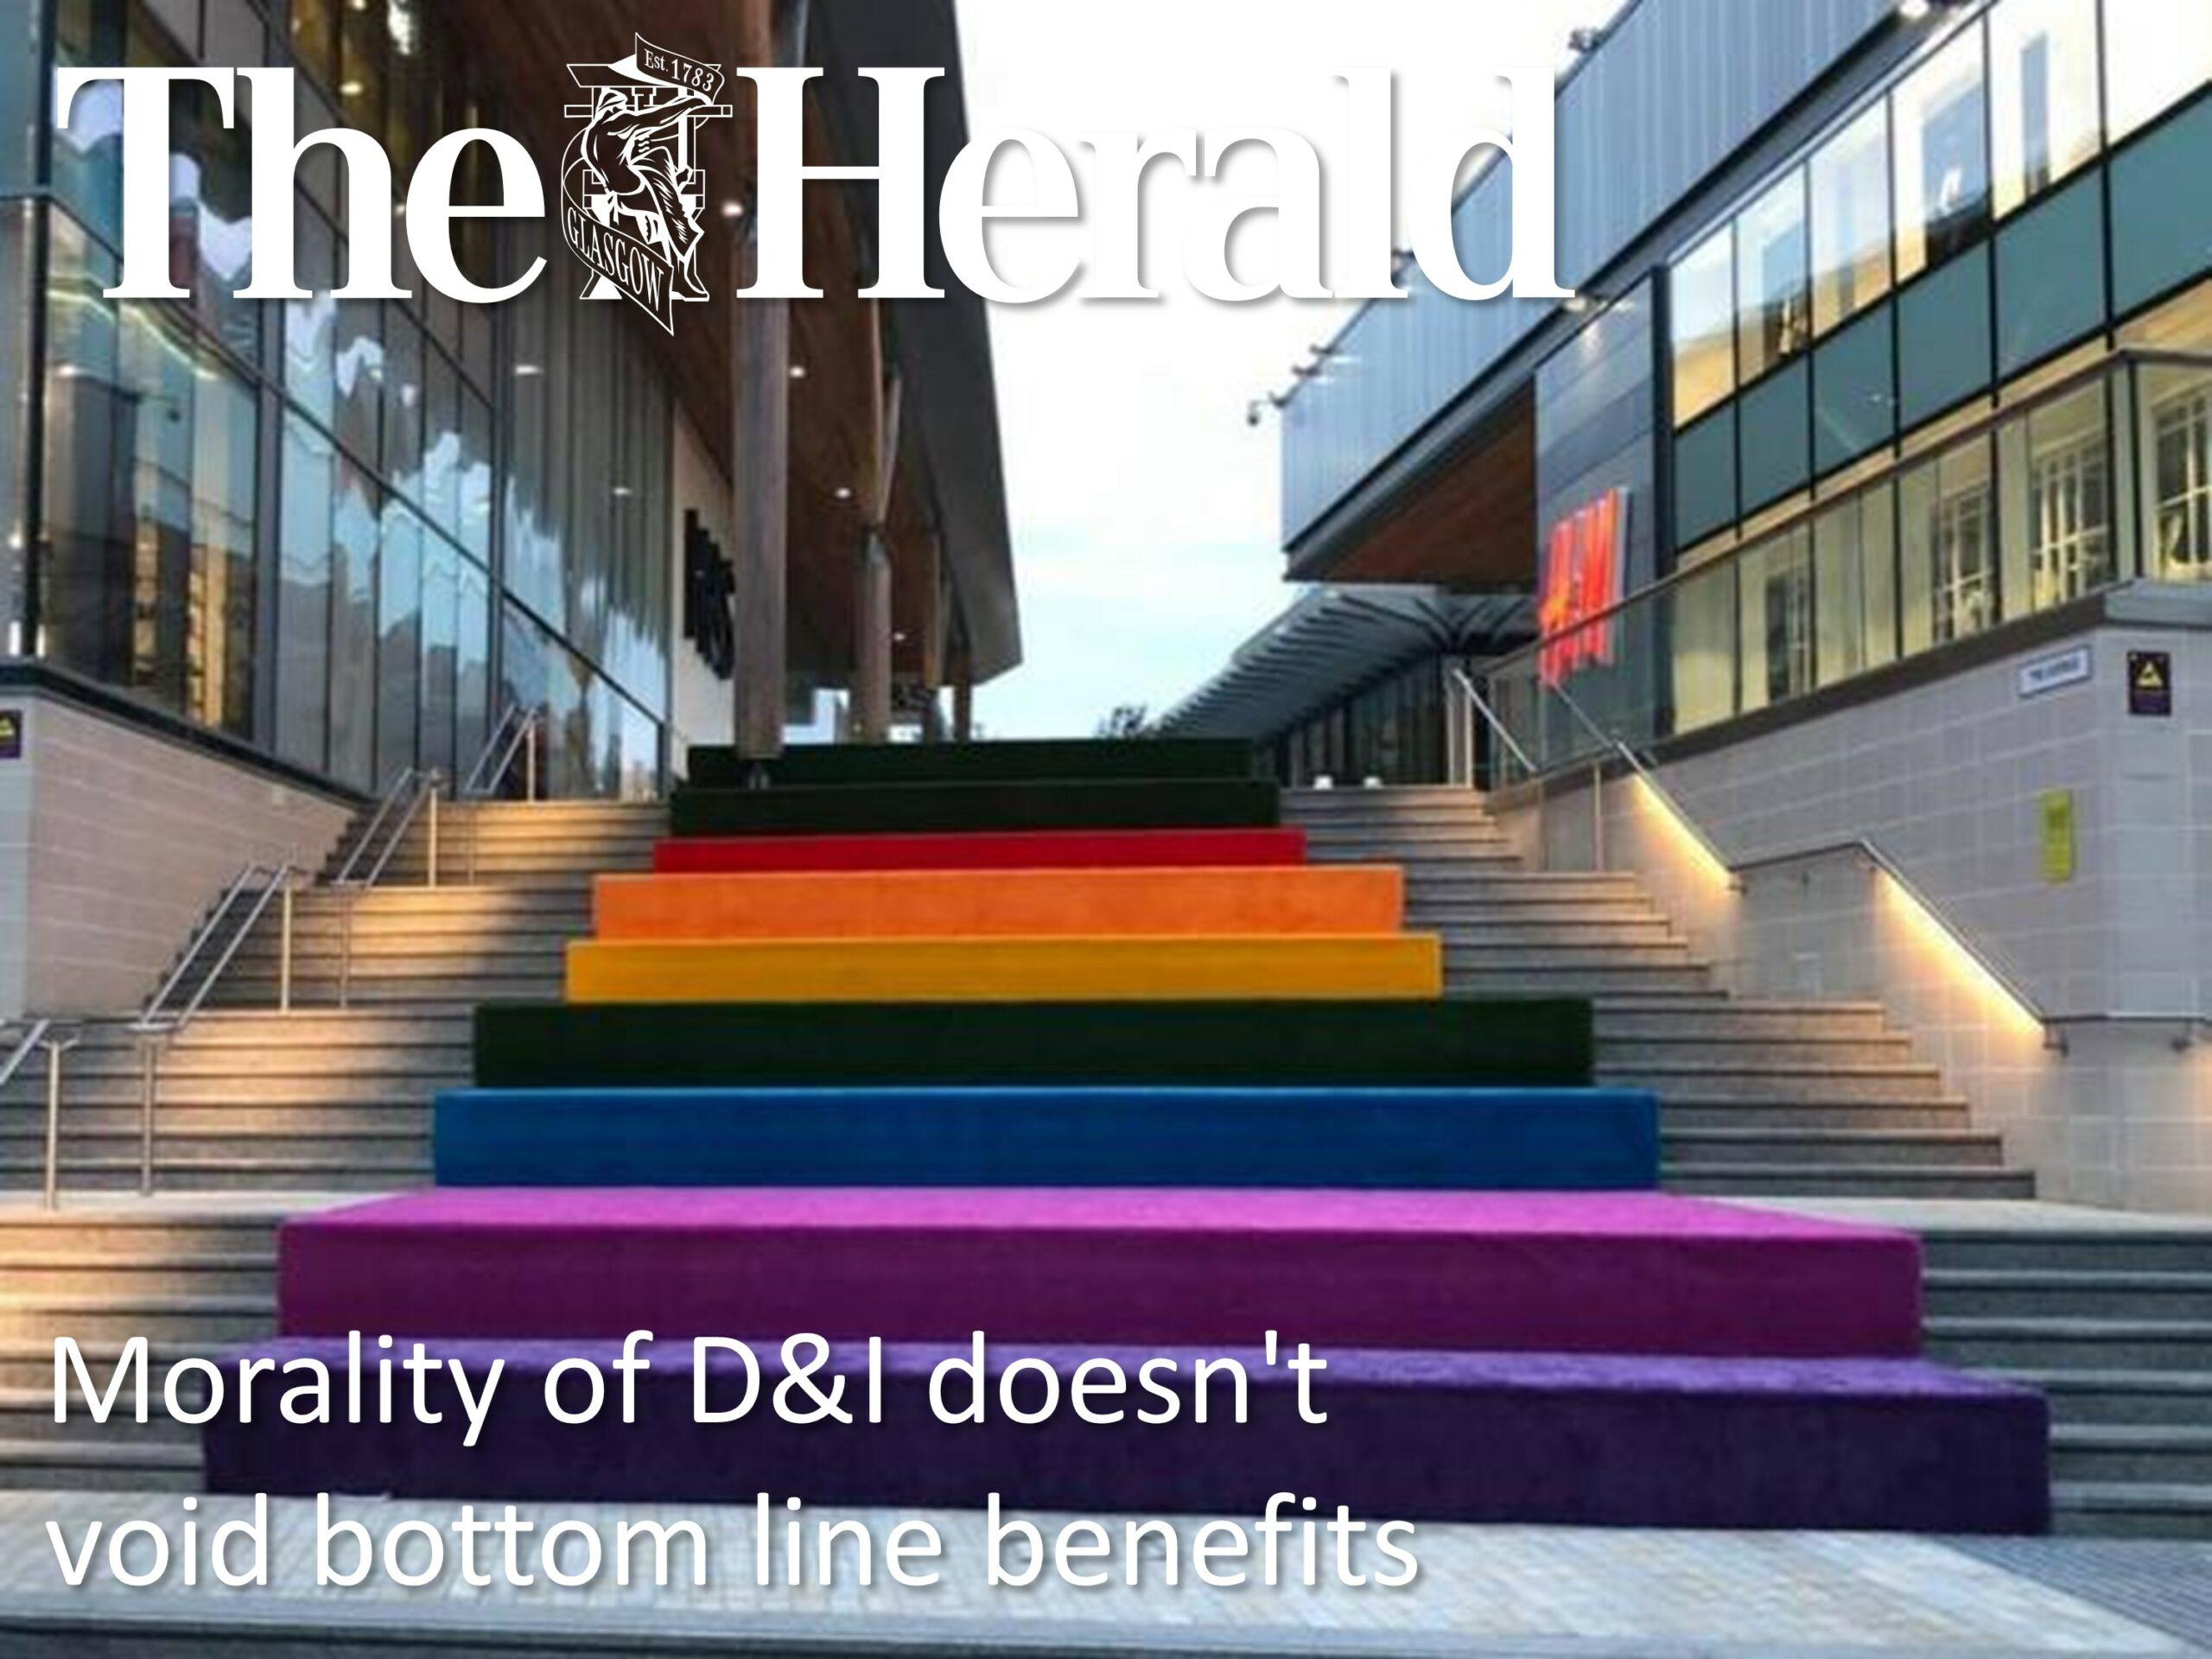 morality-of-d-i-doesnt-void-bottom-line-benefits